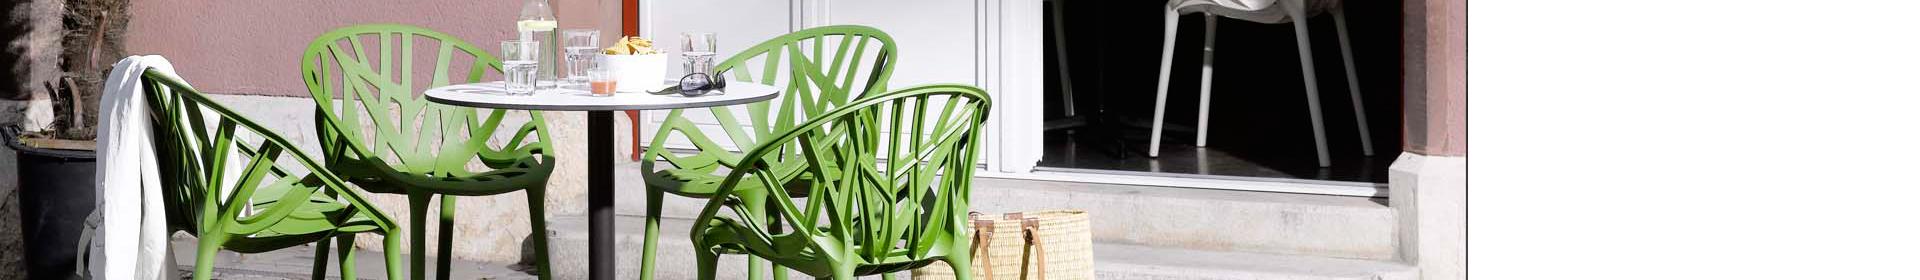 Sedie impilabili e sedie pieghevoli per l 39 outdoor shop for Sedie online shop